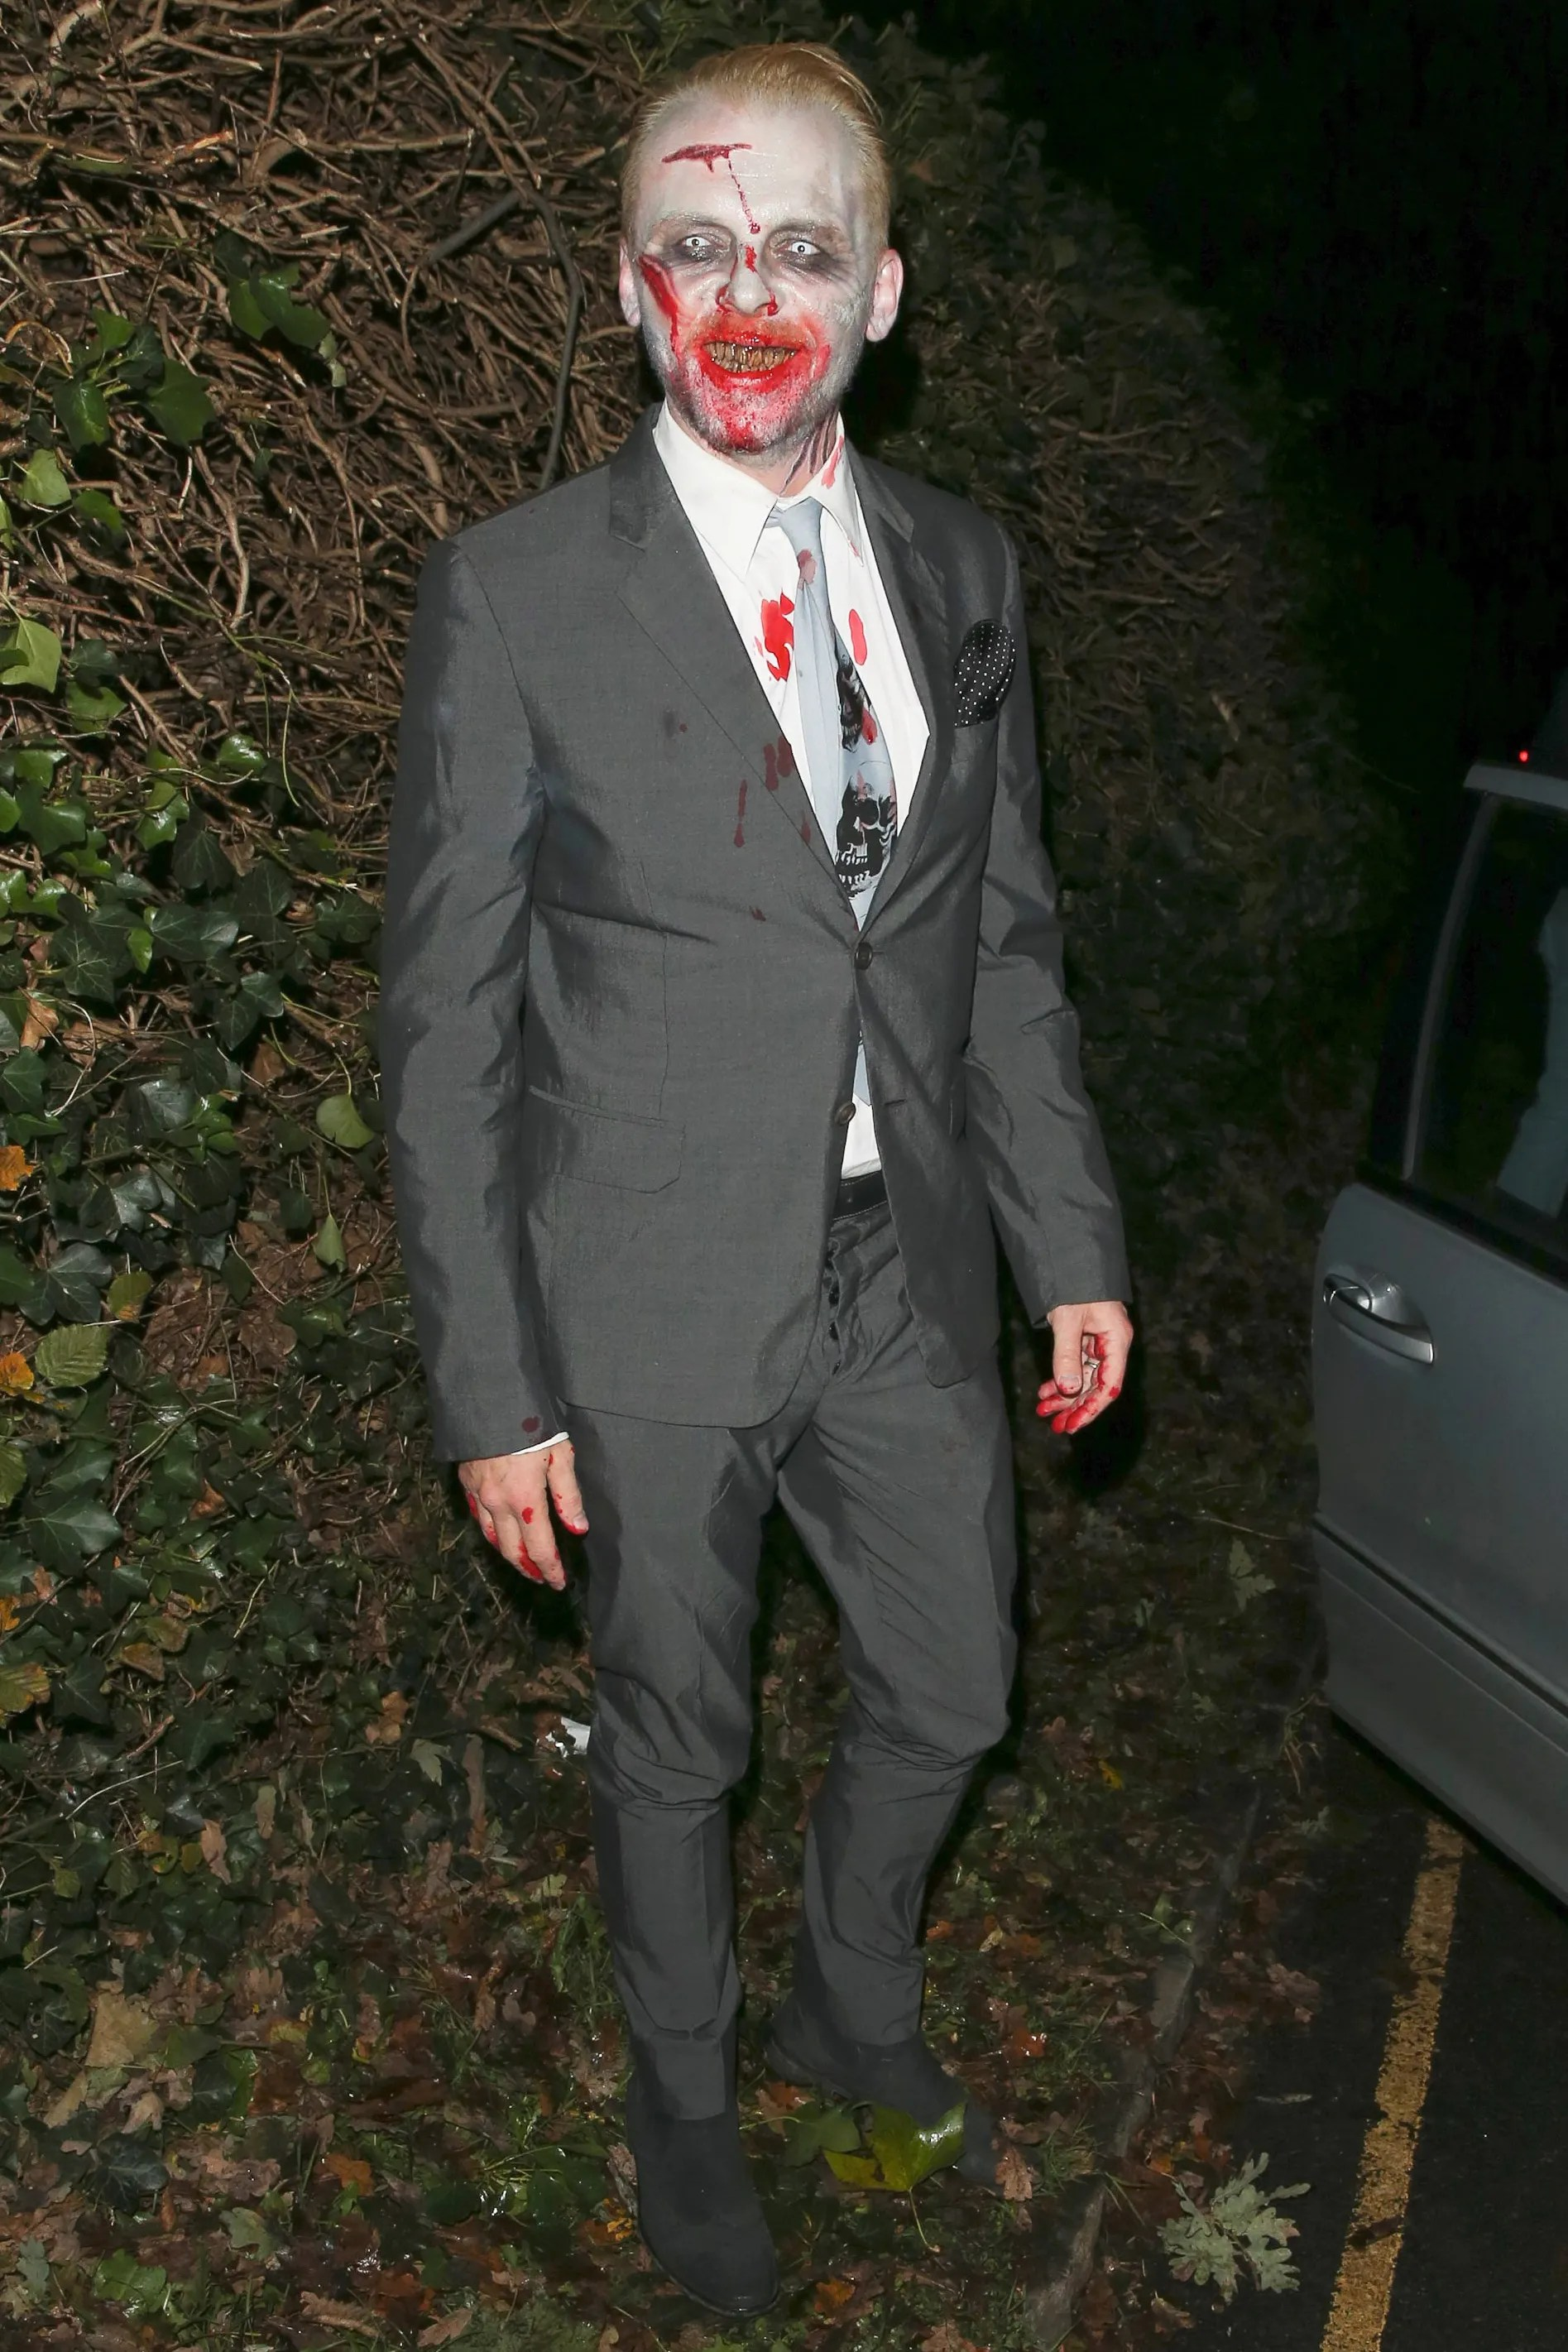 Simon Pegg (as zombie), 2013